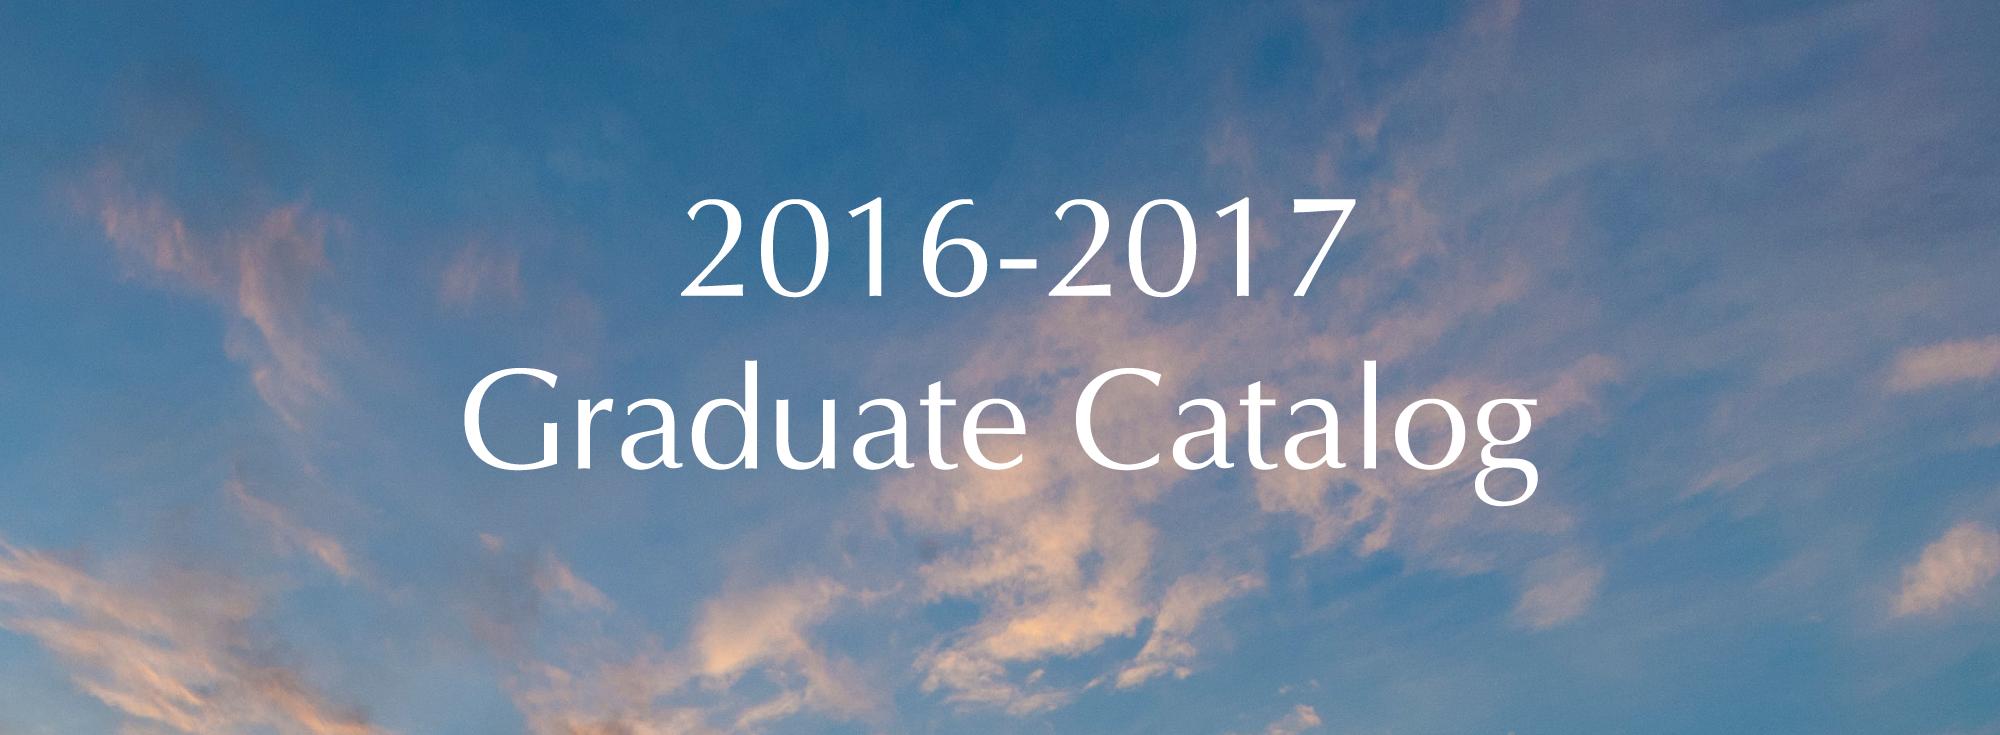 Graduate Catalog Image